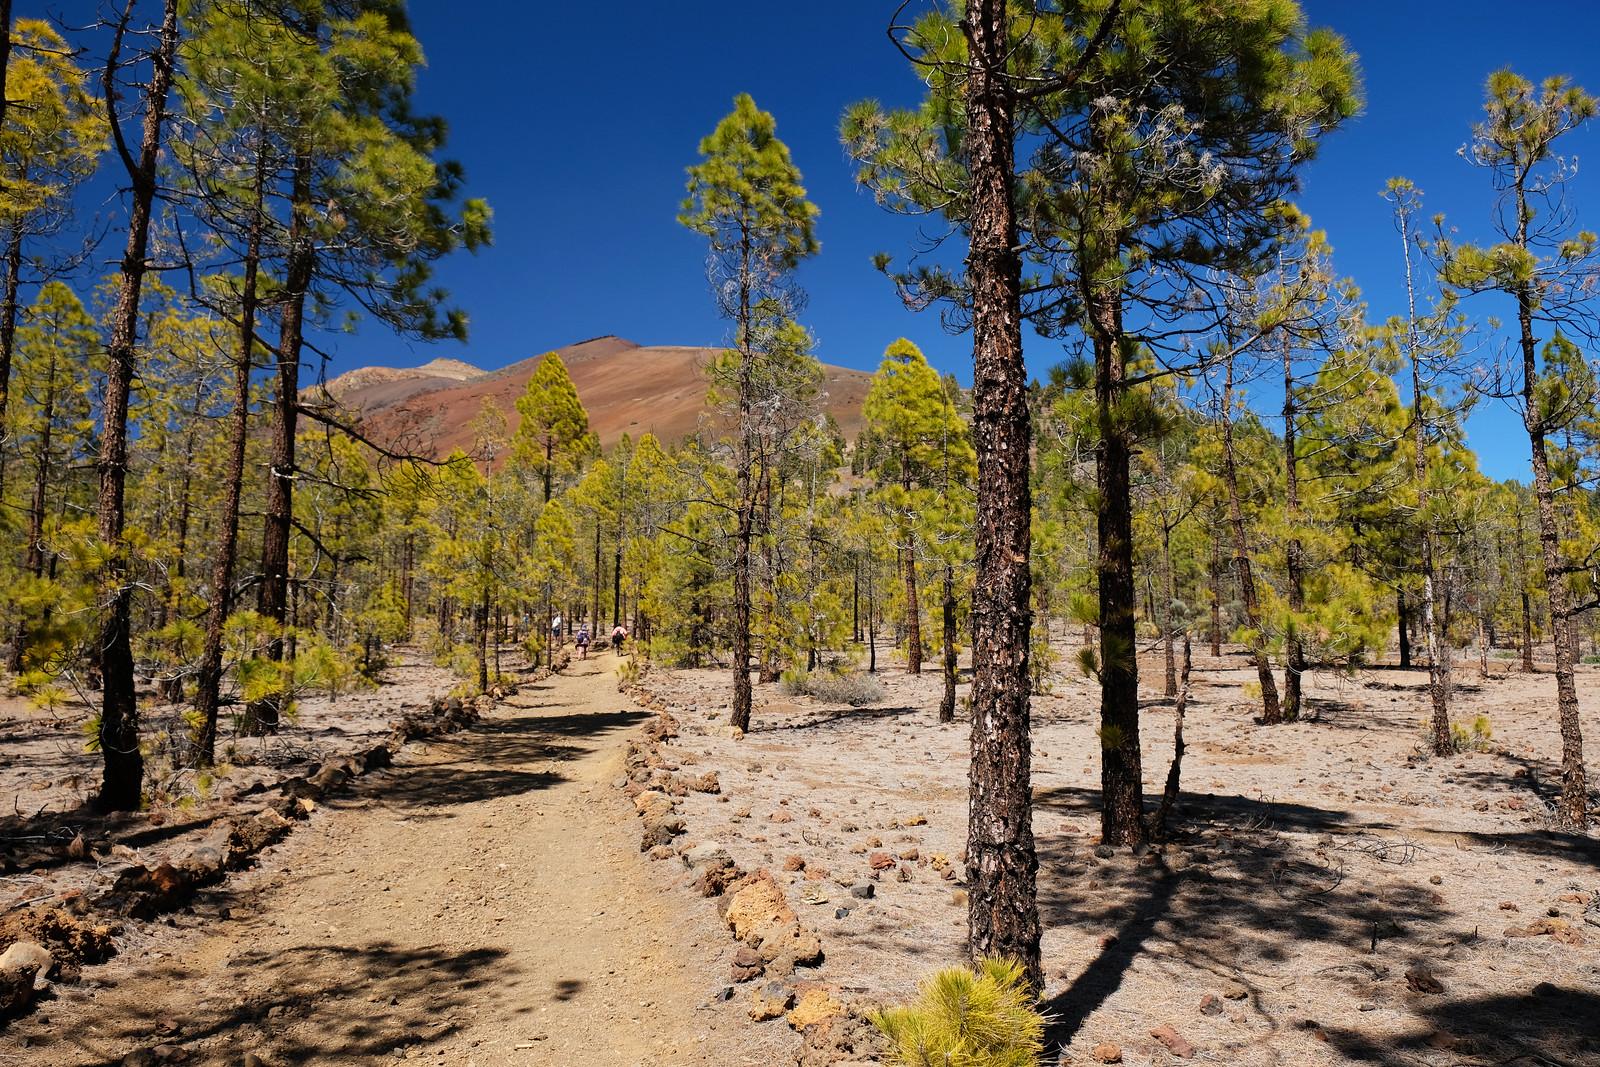 Corona Forestal Natural Park, Tenerife, Canary Islands, Spain